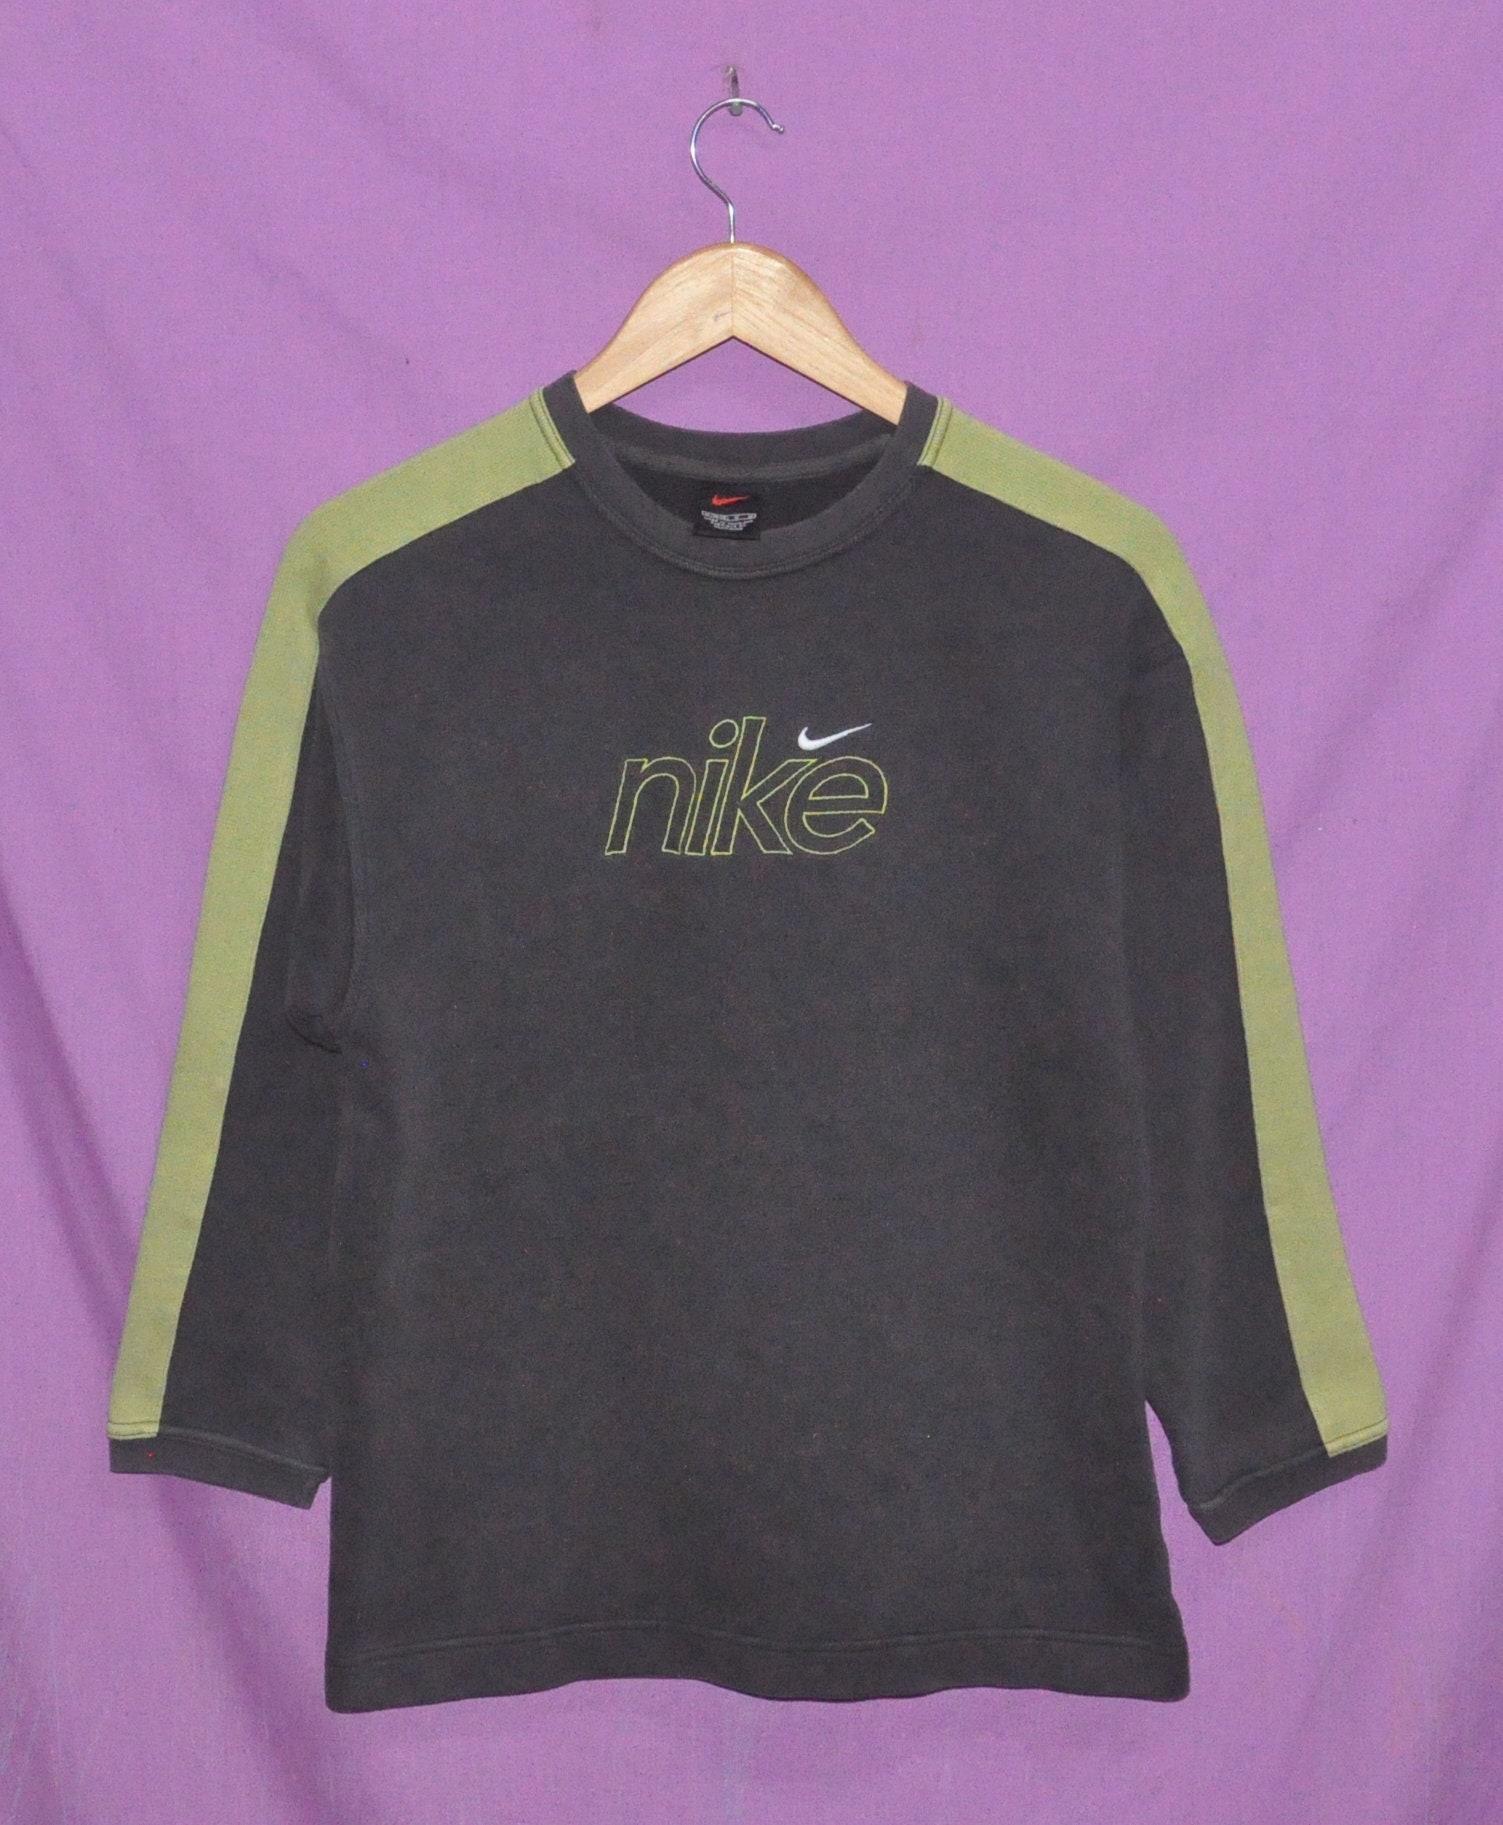 5b0041b9 Retro Nike Crewneck Sweatshirts – EDGE Engineering and Consulting ...